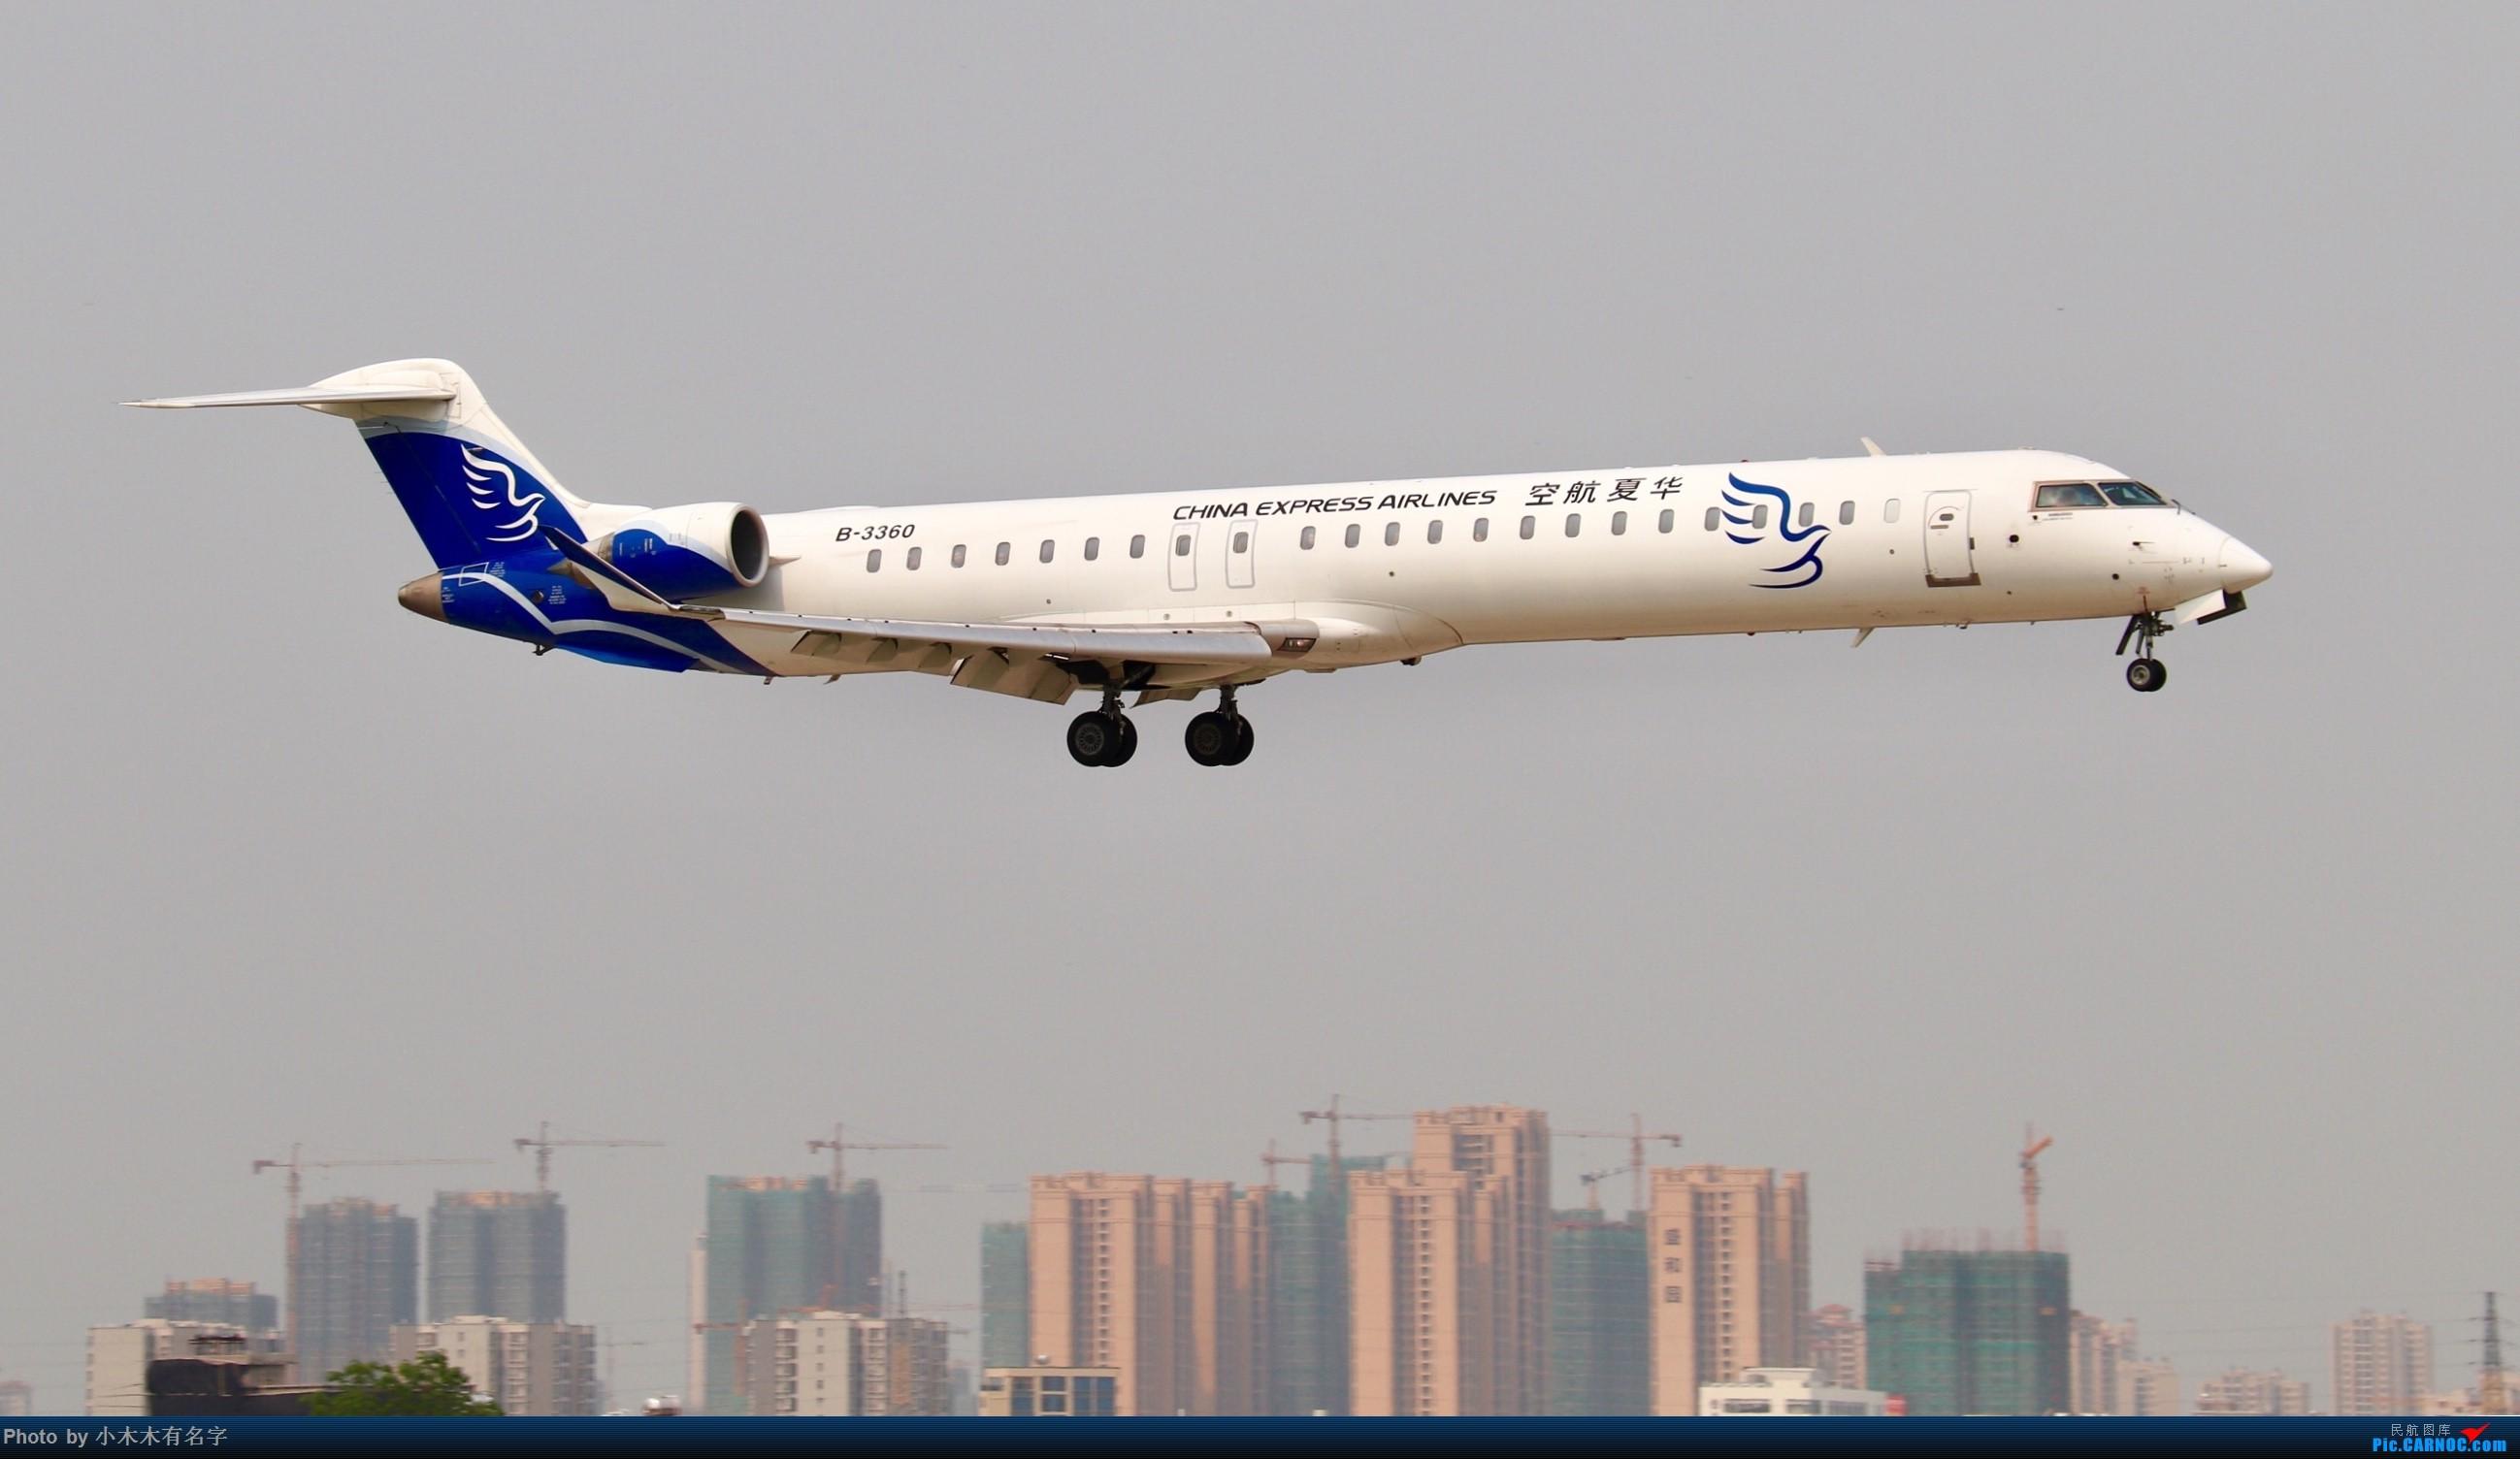 Re:[原创]2019年4月20日ZHA拍机 BOMBARDIER CRJ900NG B-3360 中国湛江机场